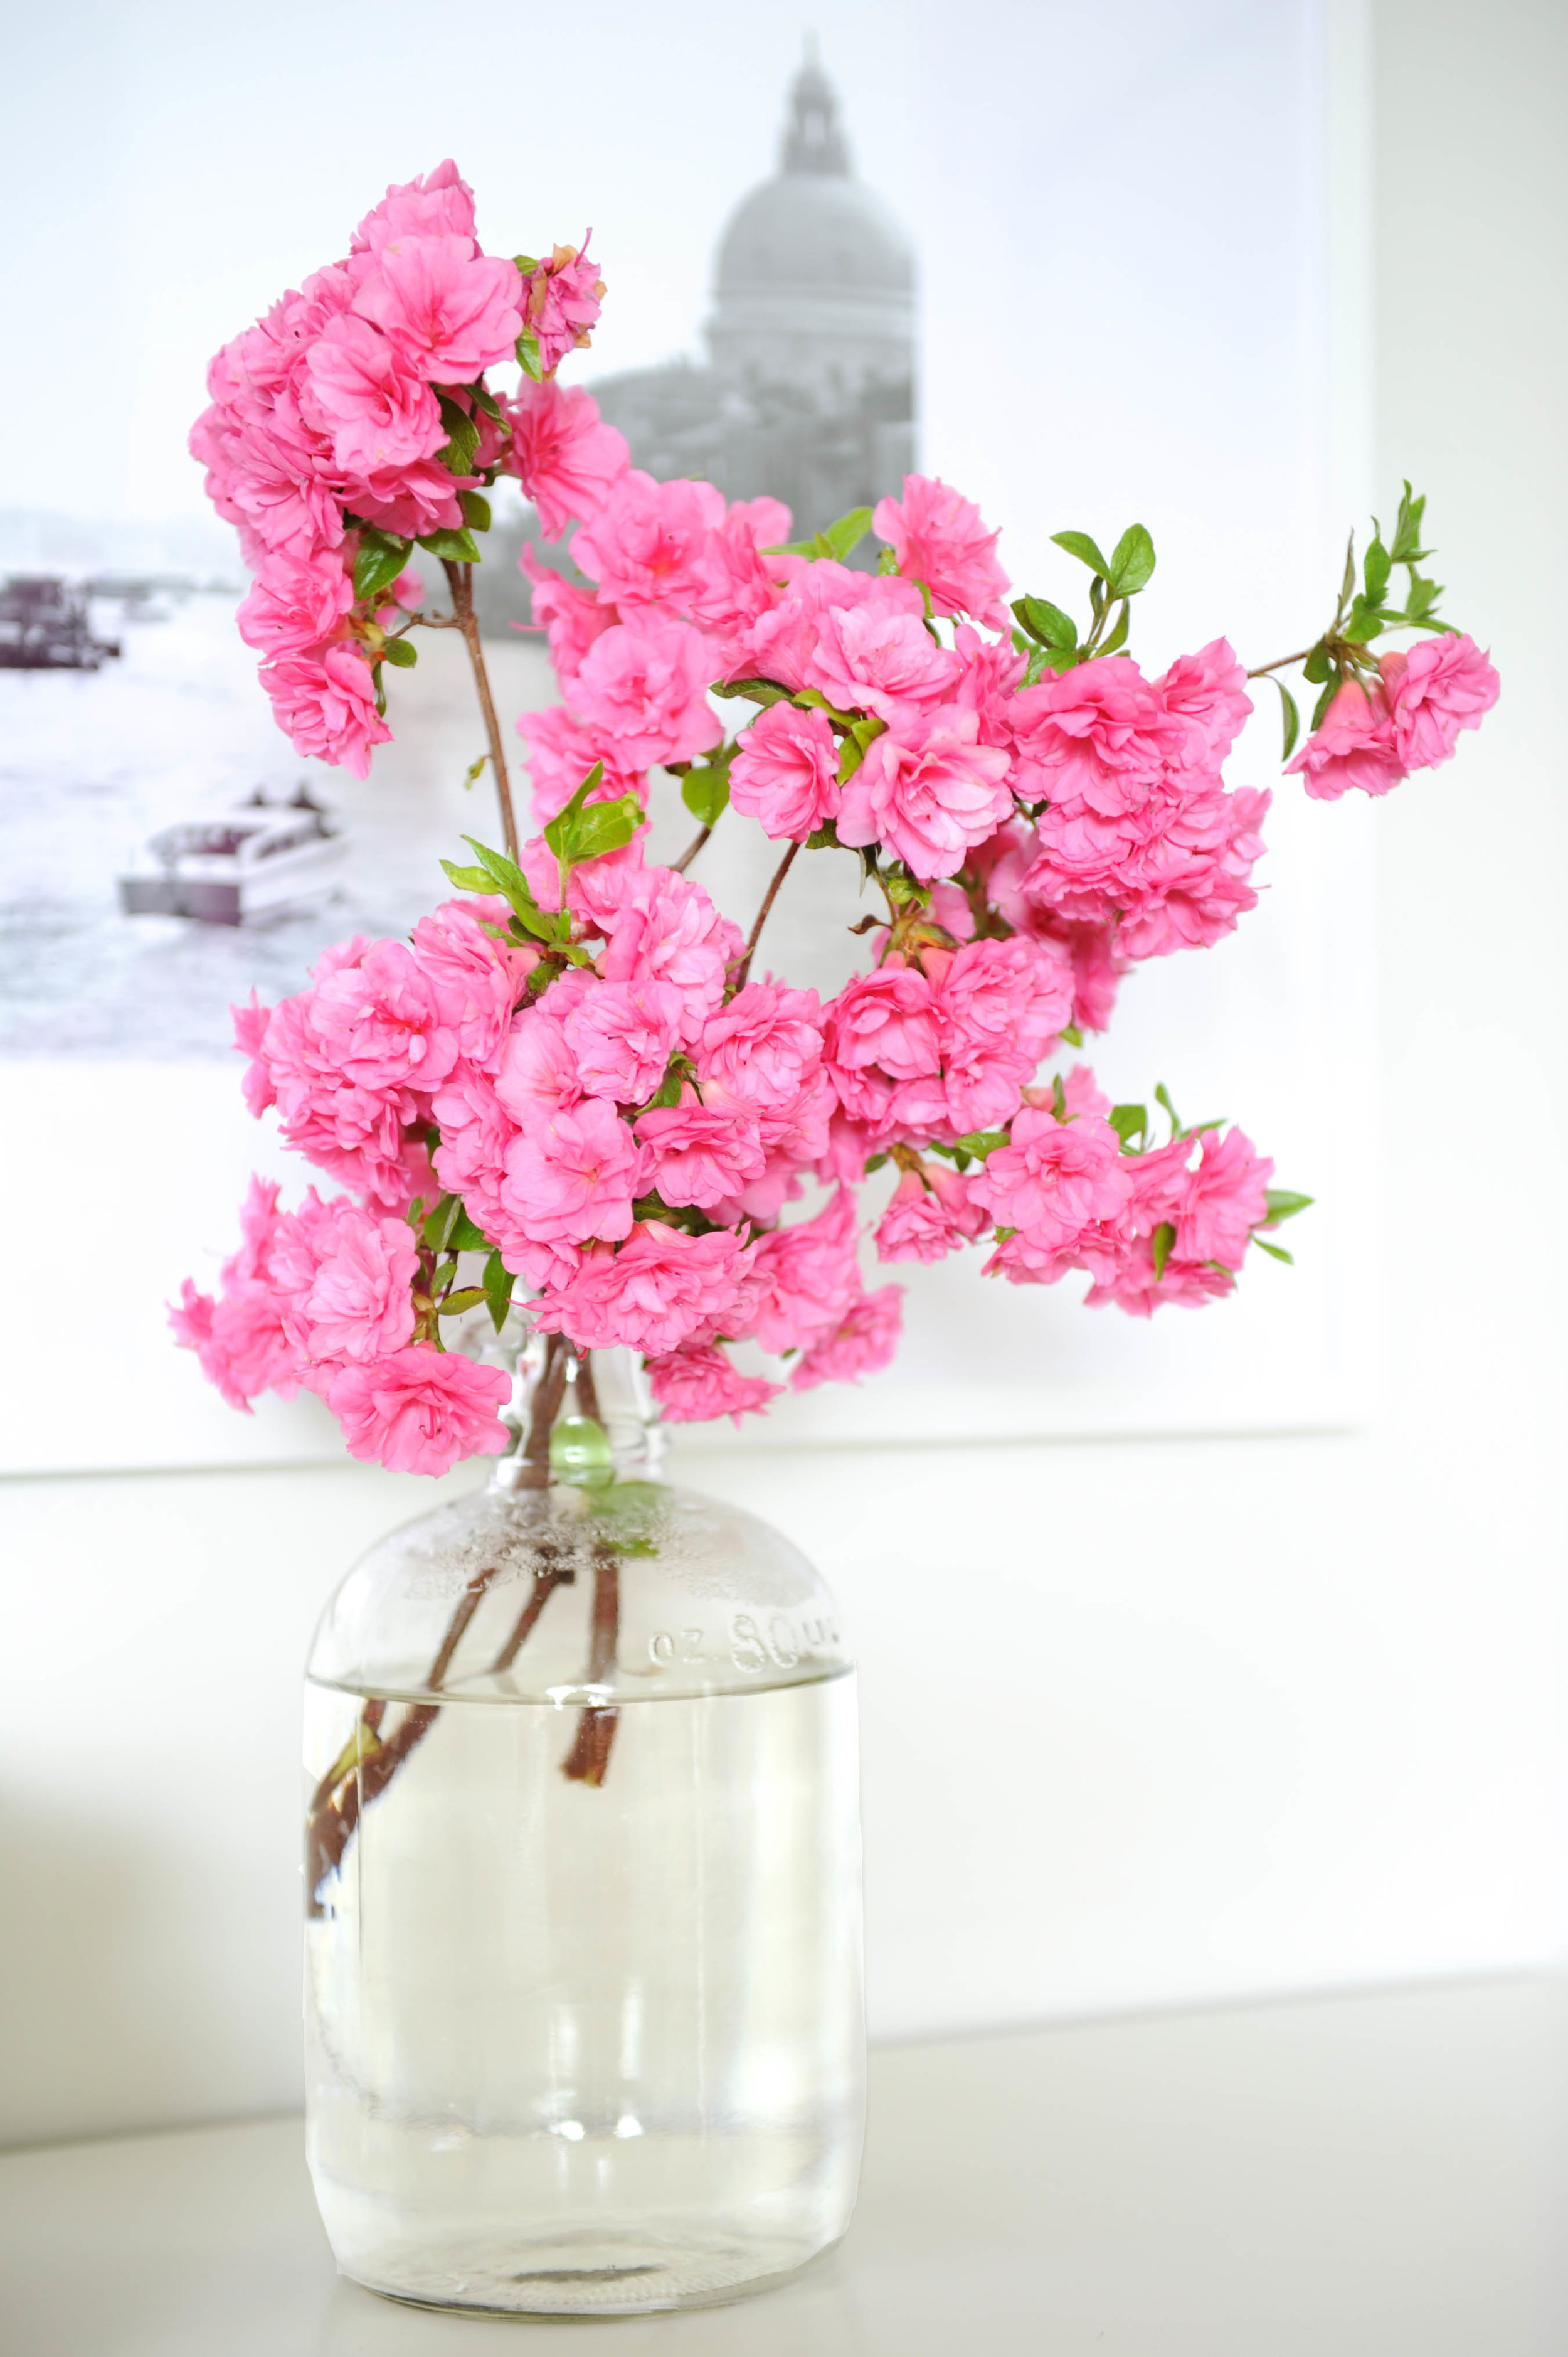 Fleurs www.traceyaytonphotography.com